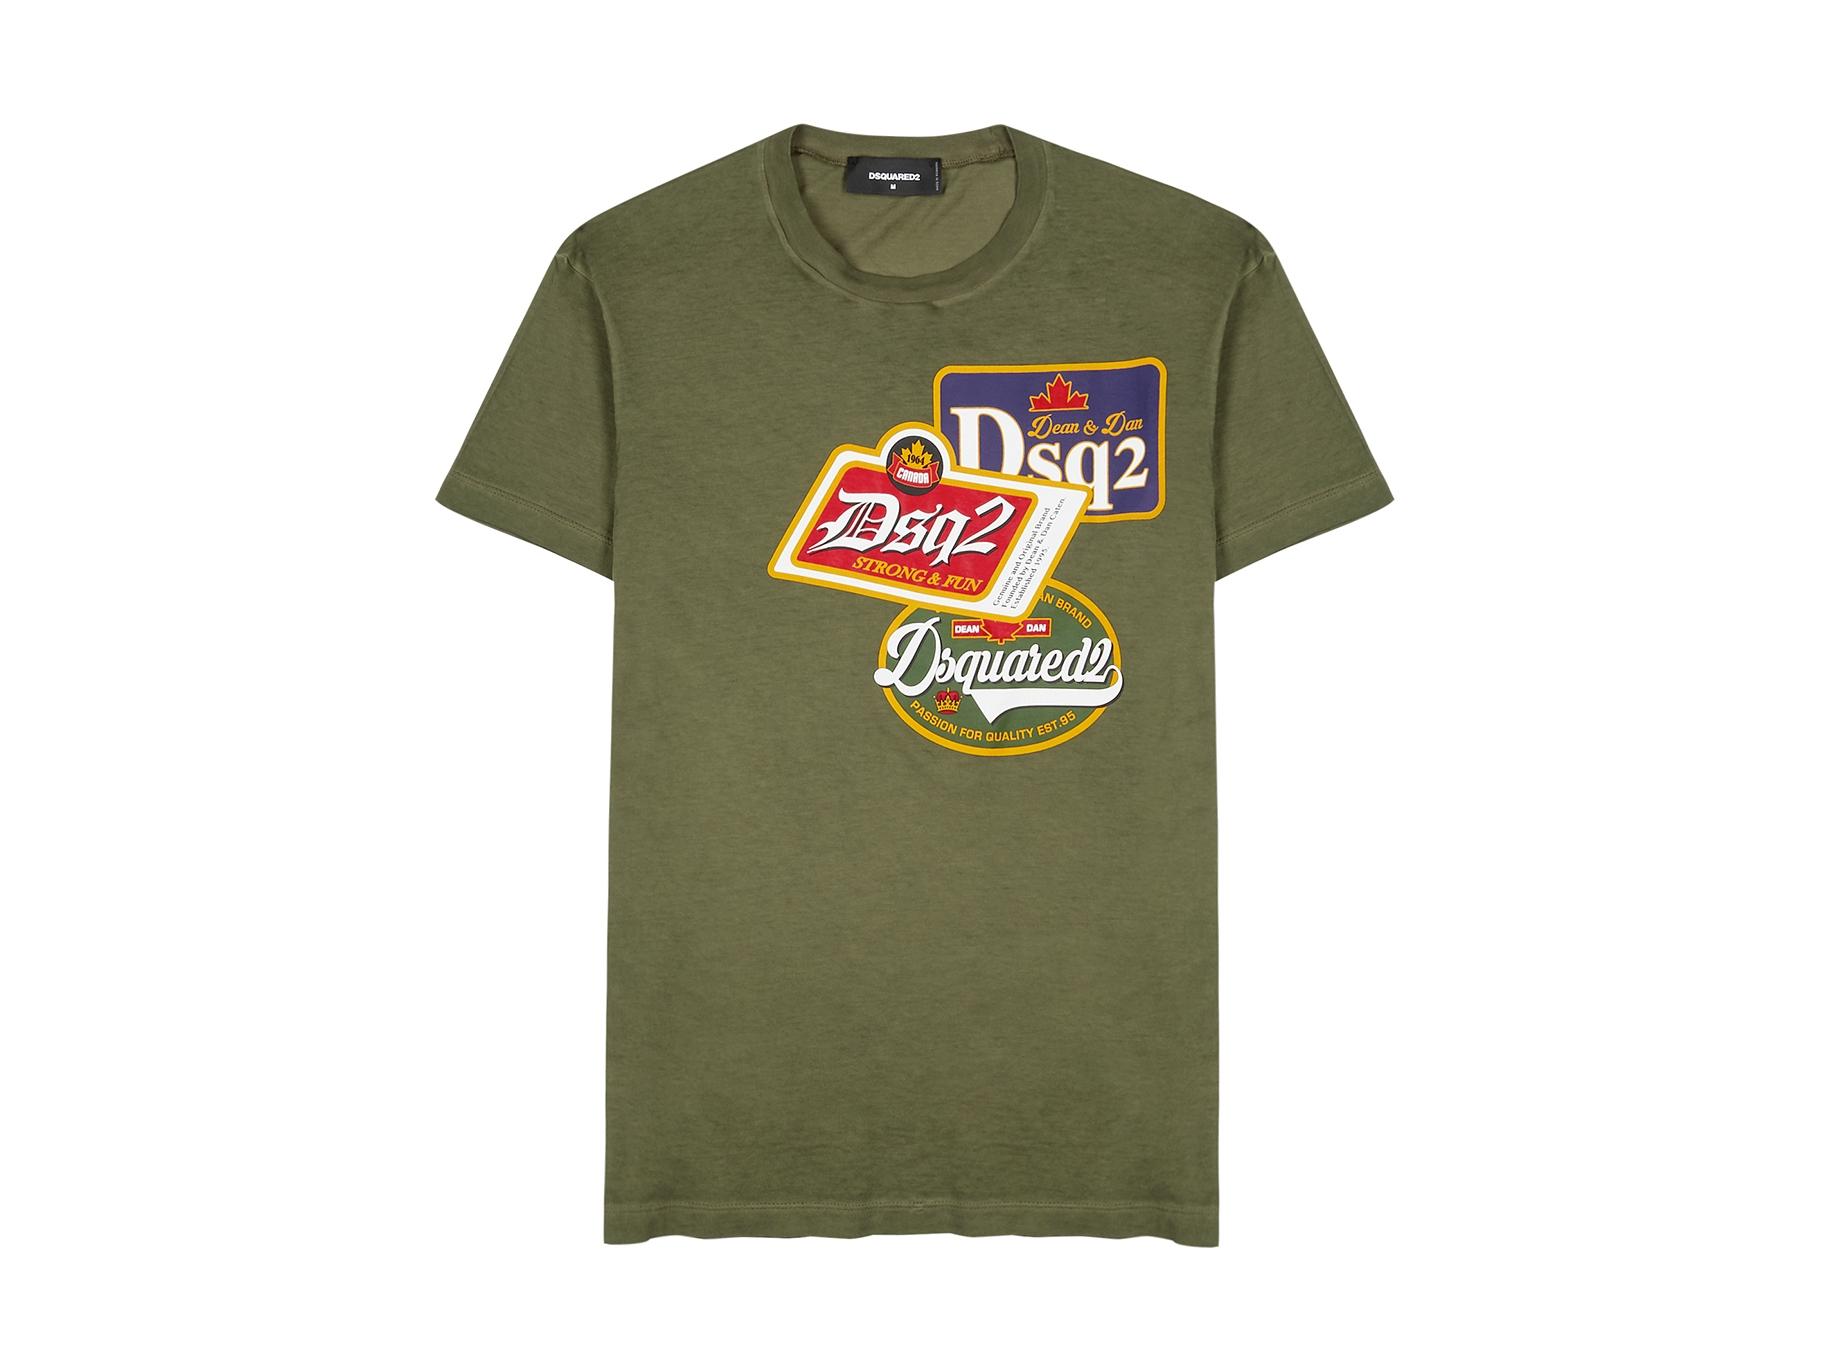 efe3f00c Army green printed cotton T-shirt